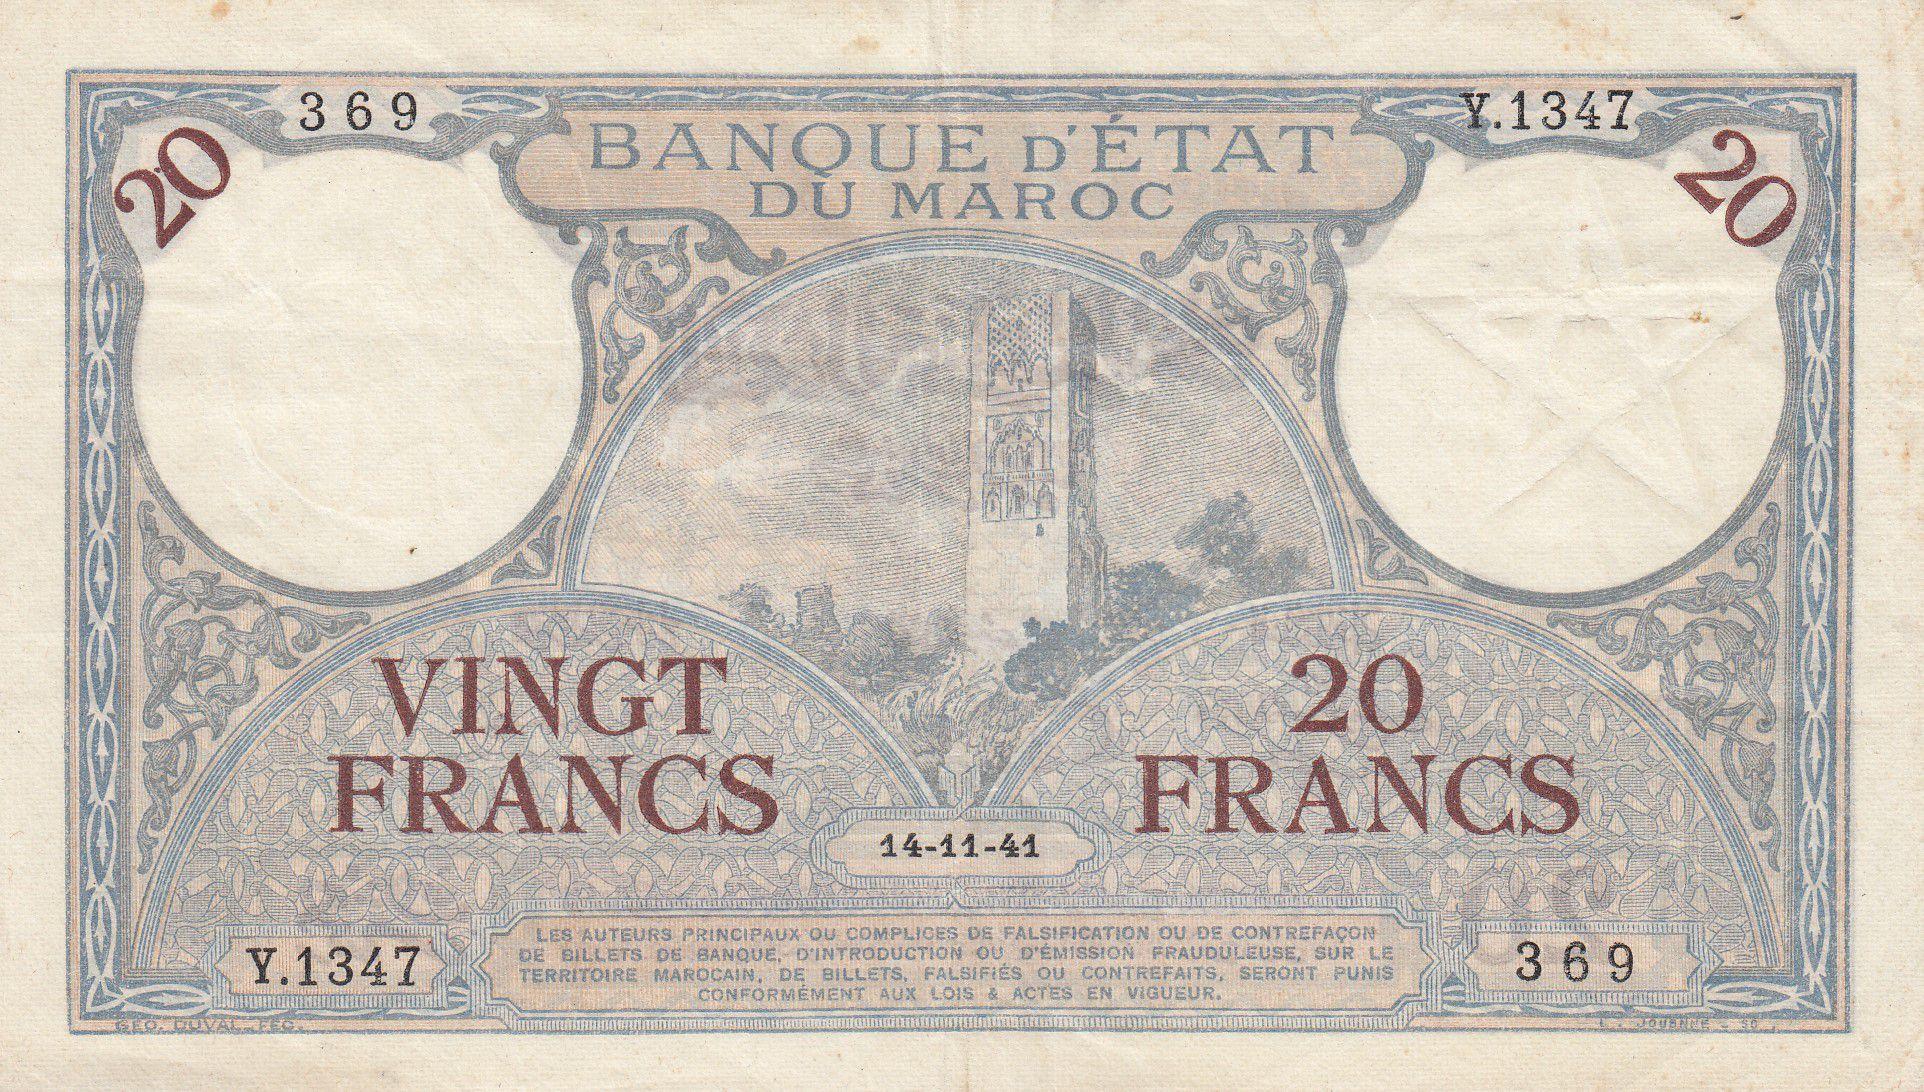 Maroc 20 Francs Minaret - 14-11-1941  -  TTB + - Série Y.1347 - P.18b